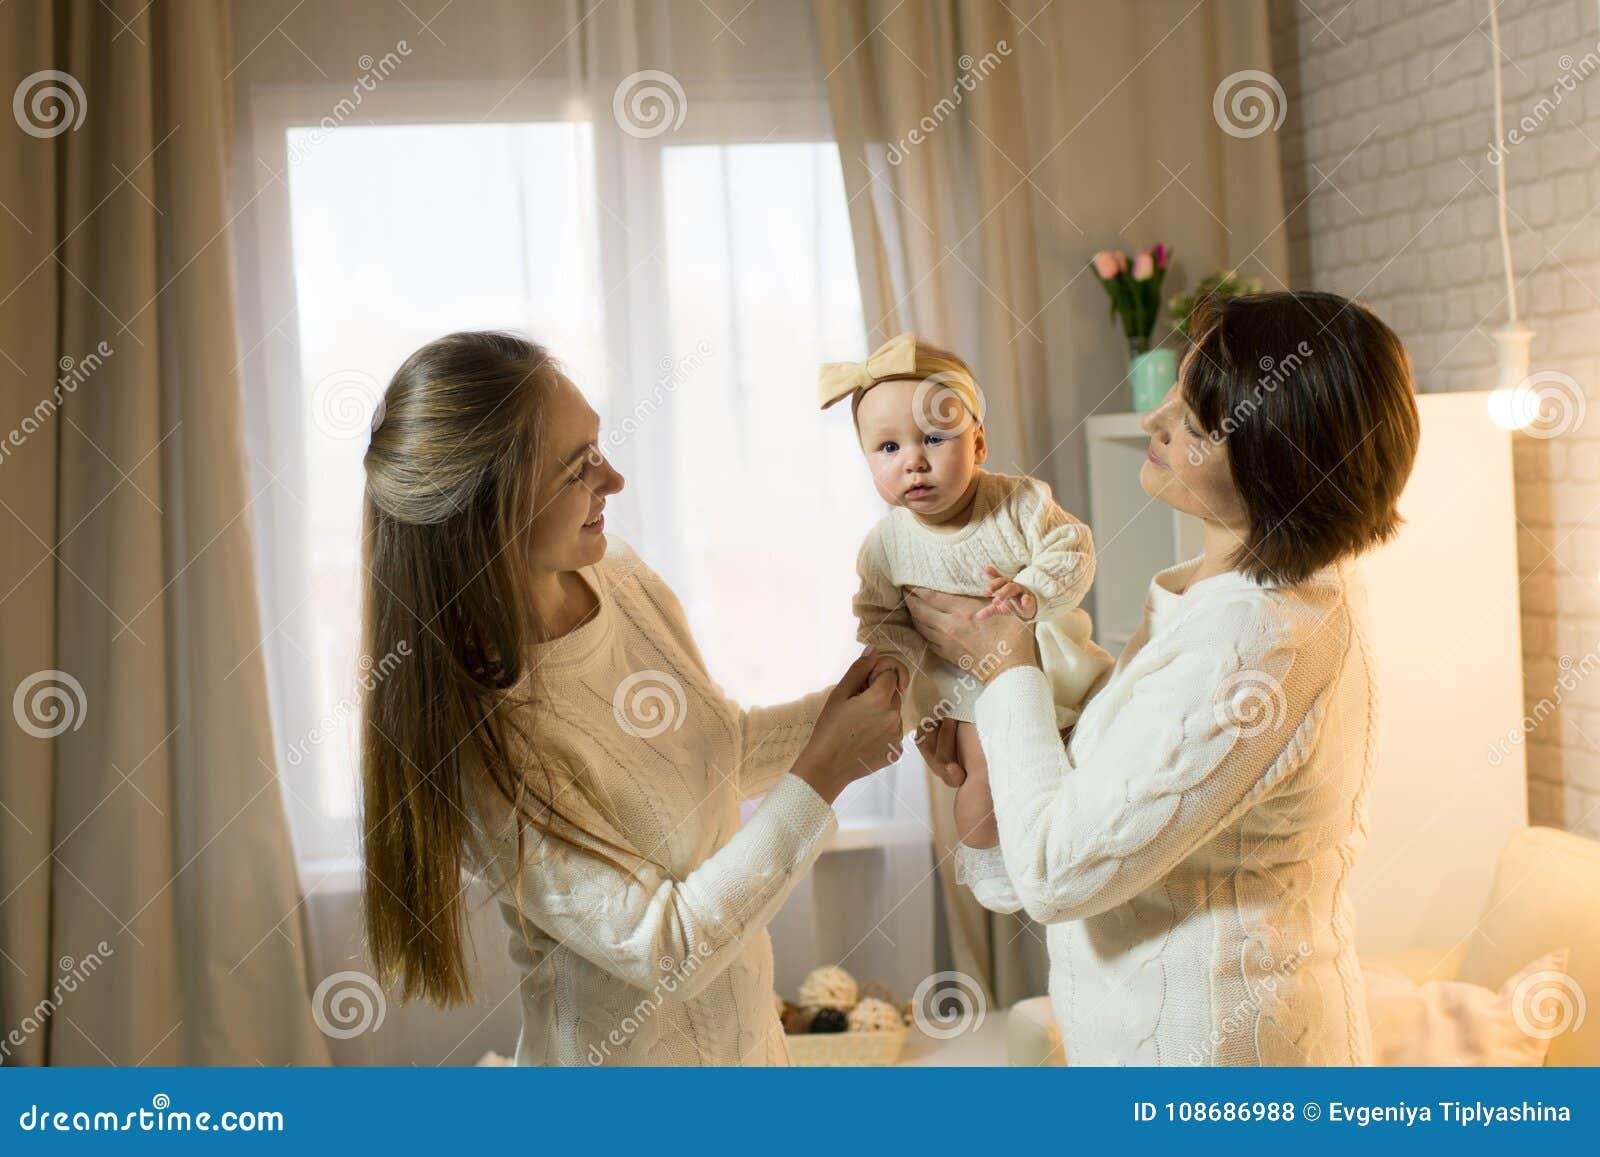 Grandmother mum and granddaughter